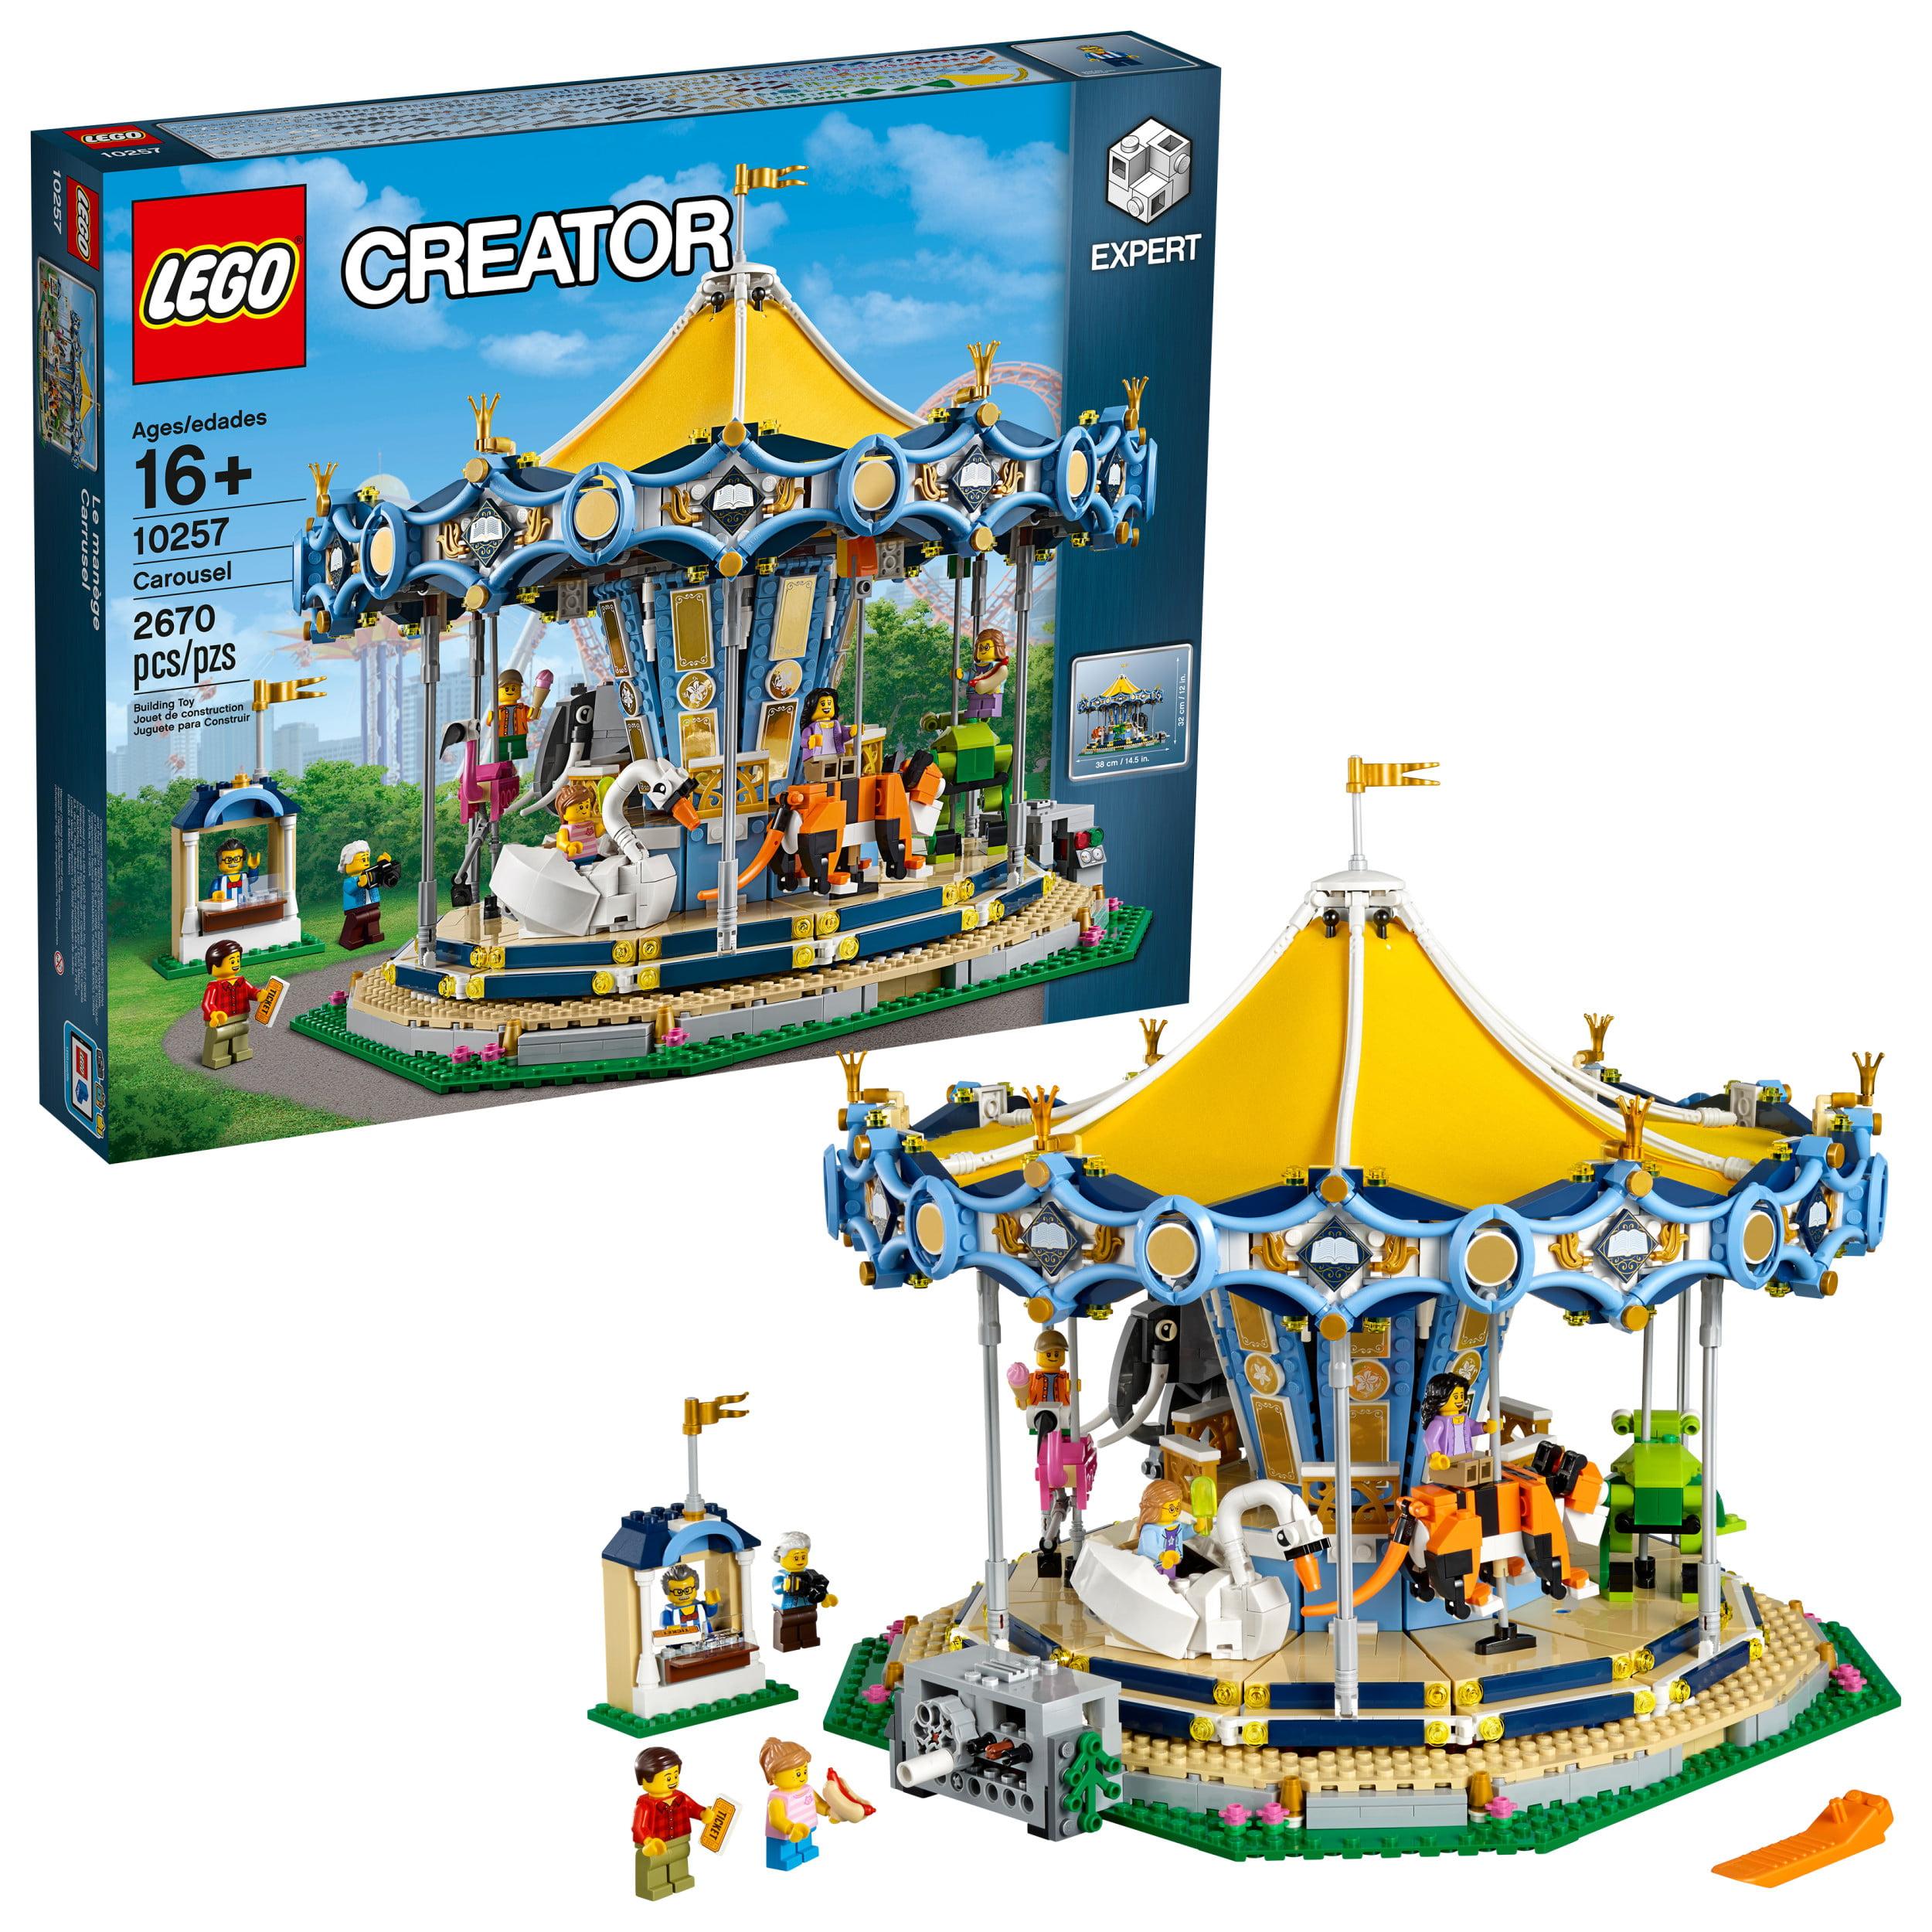 Lego Creator Expert Carousel 10257 by LEGO System Inc